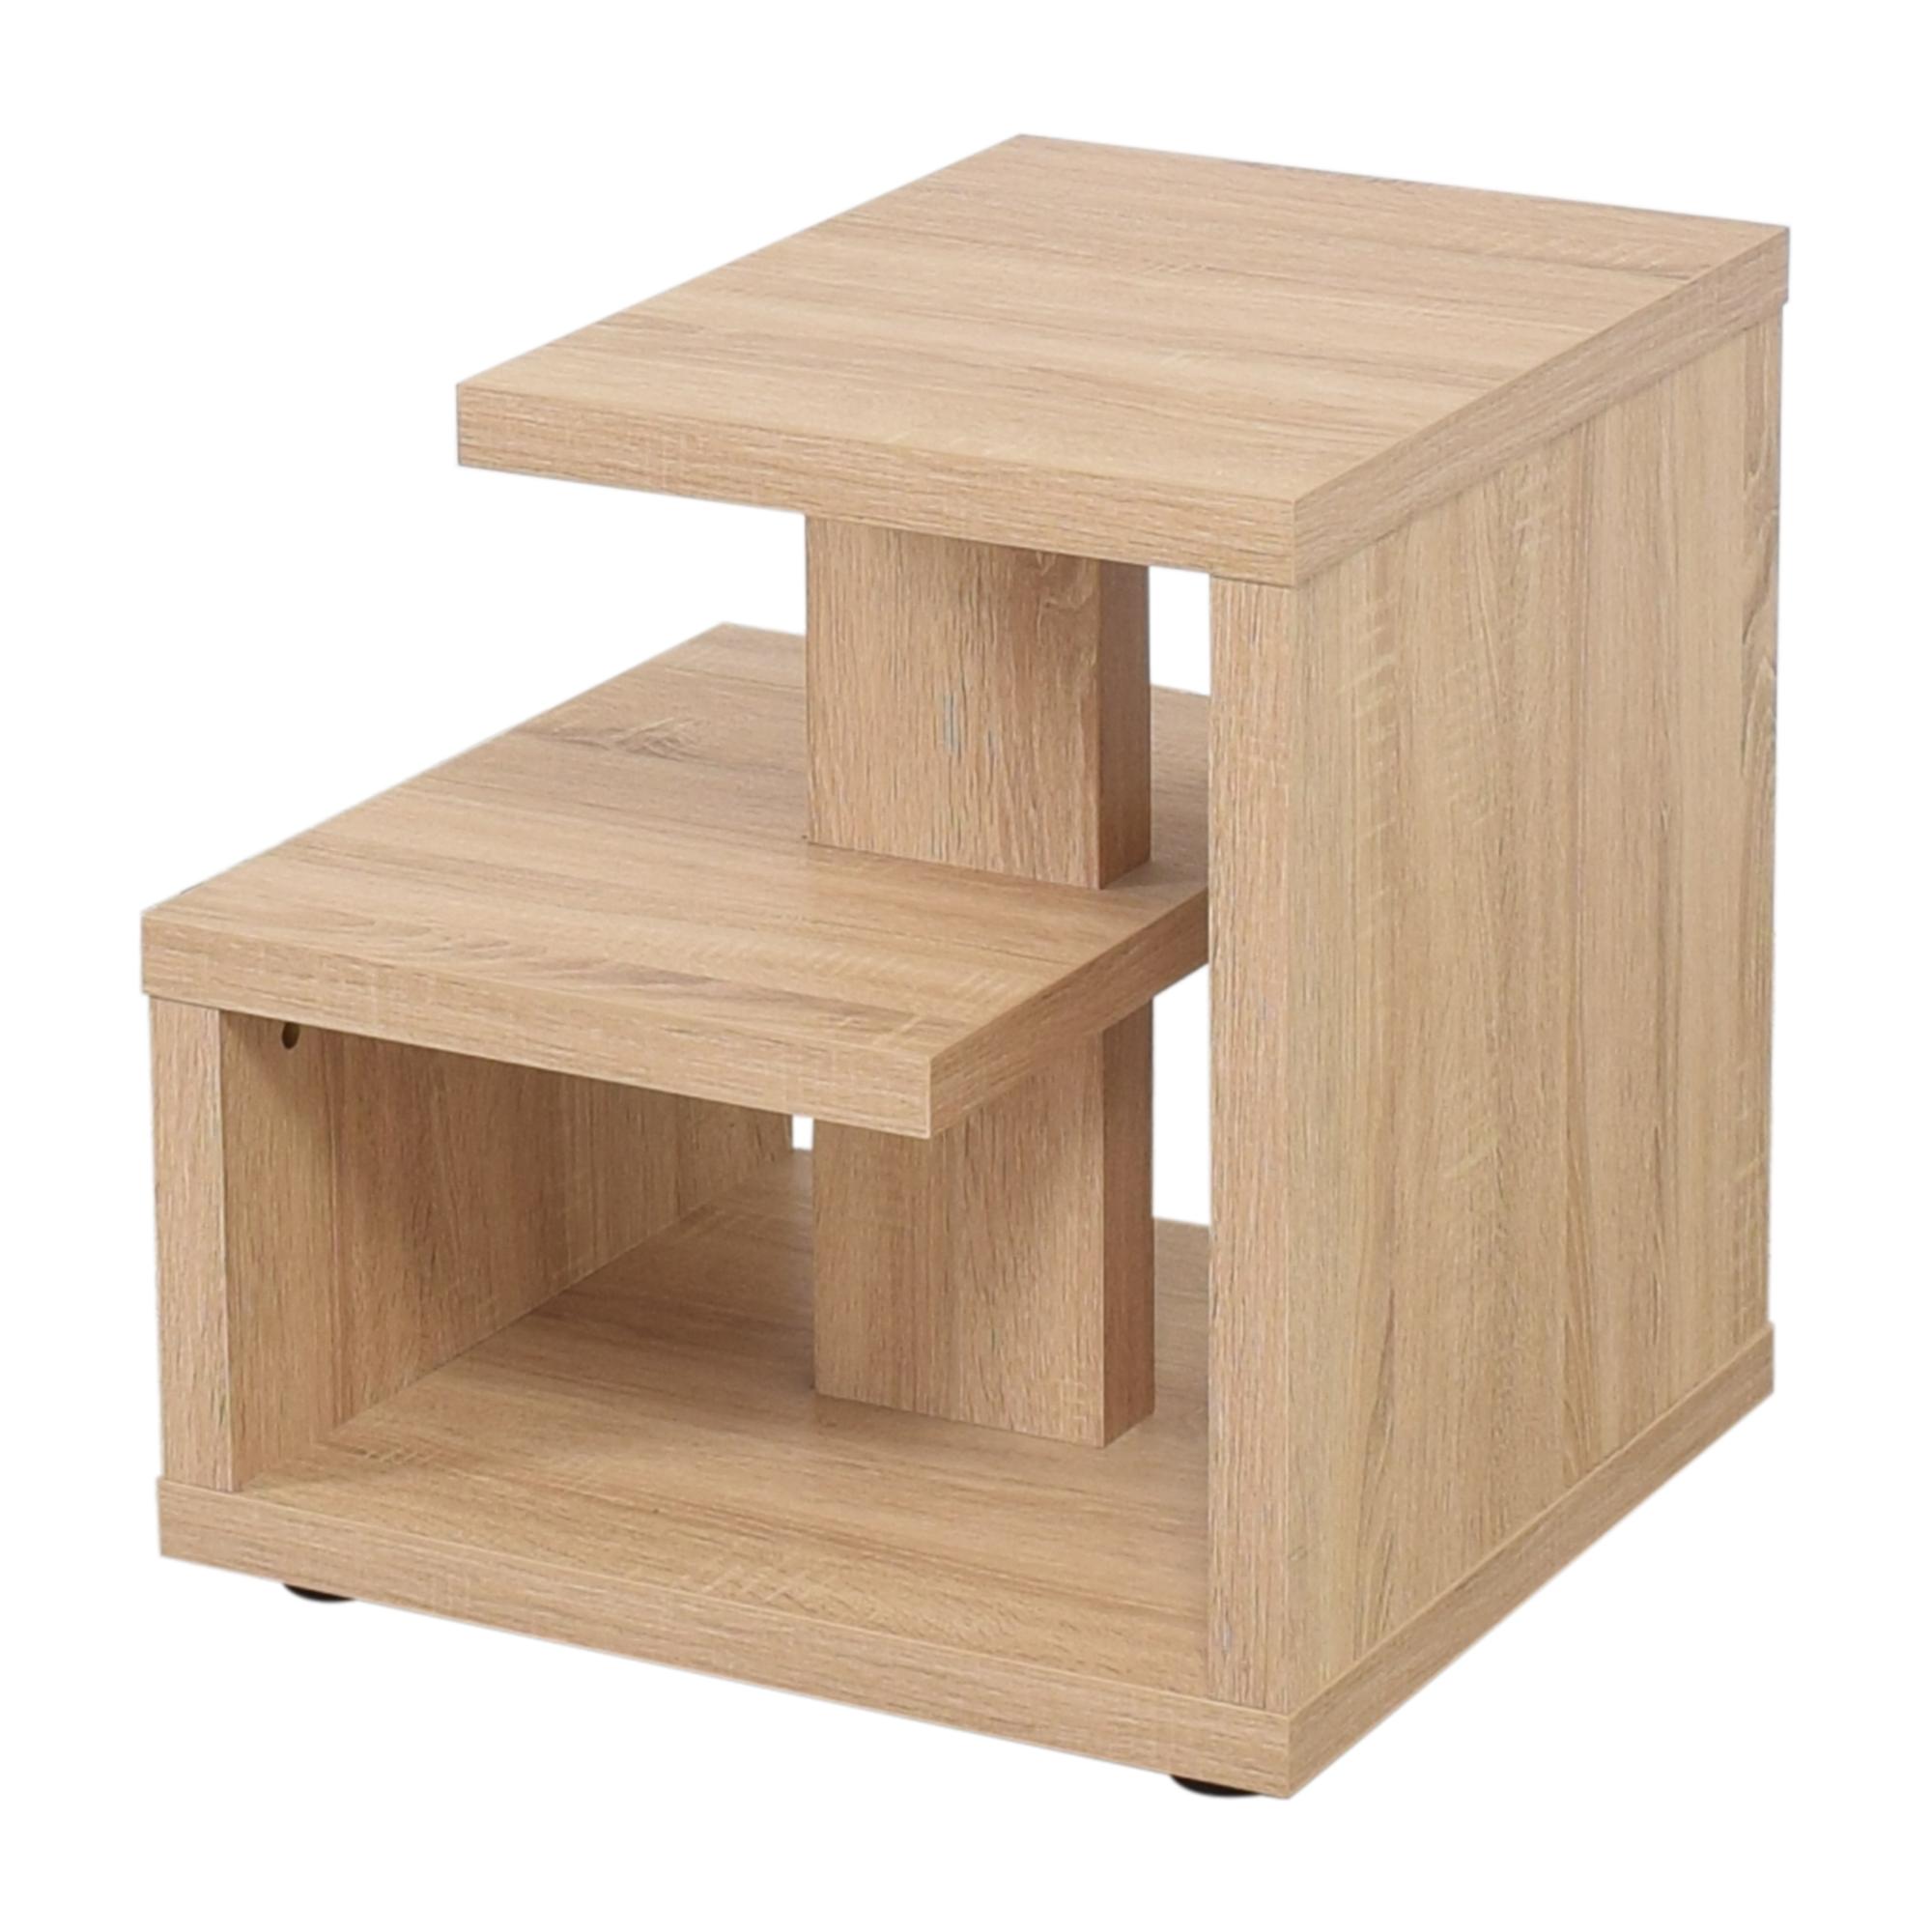 West Elm West Elm Modern End Table on sale